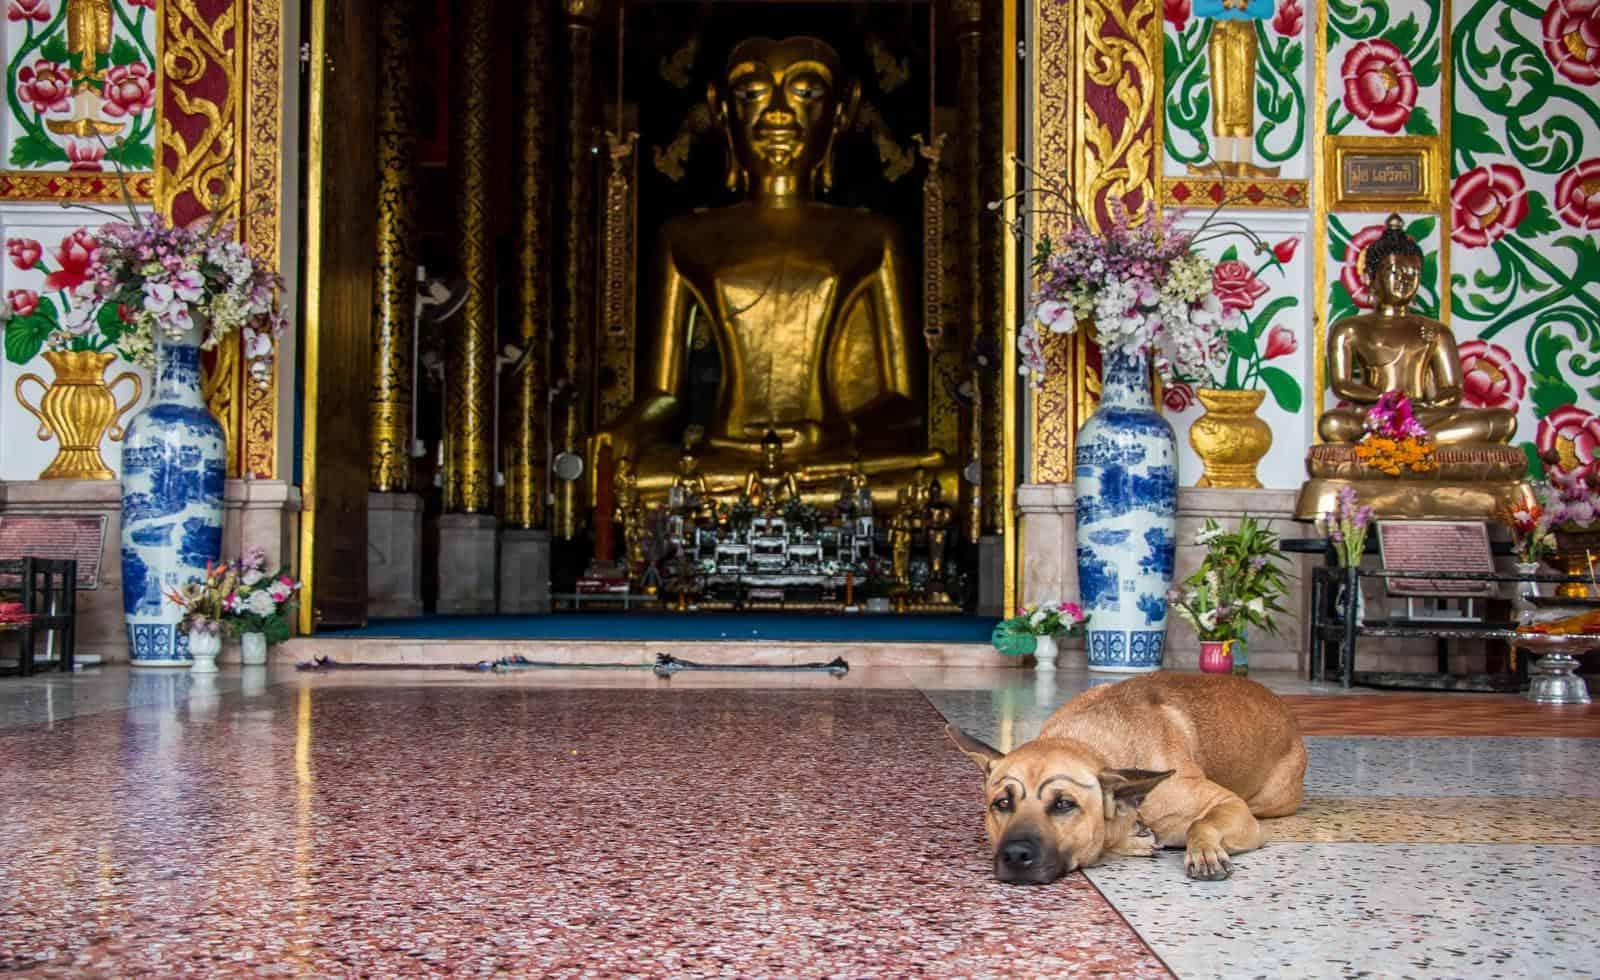 Chiang Rai Itinerary: 10 Things To Do In Chiang Rai That You Can't Miss